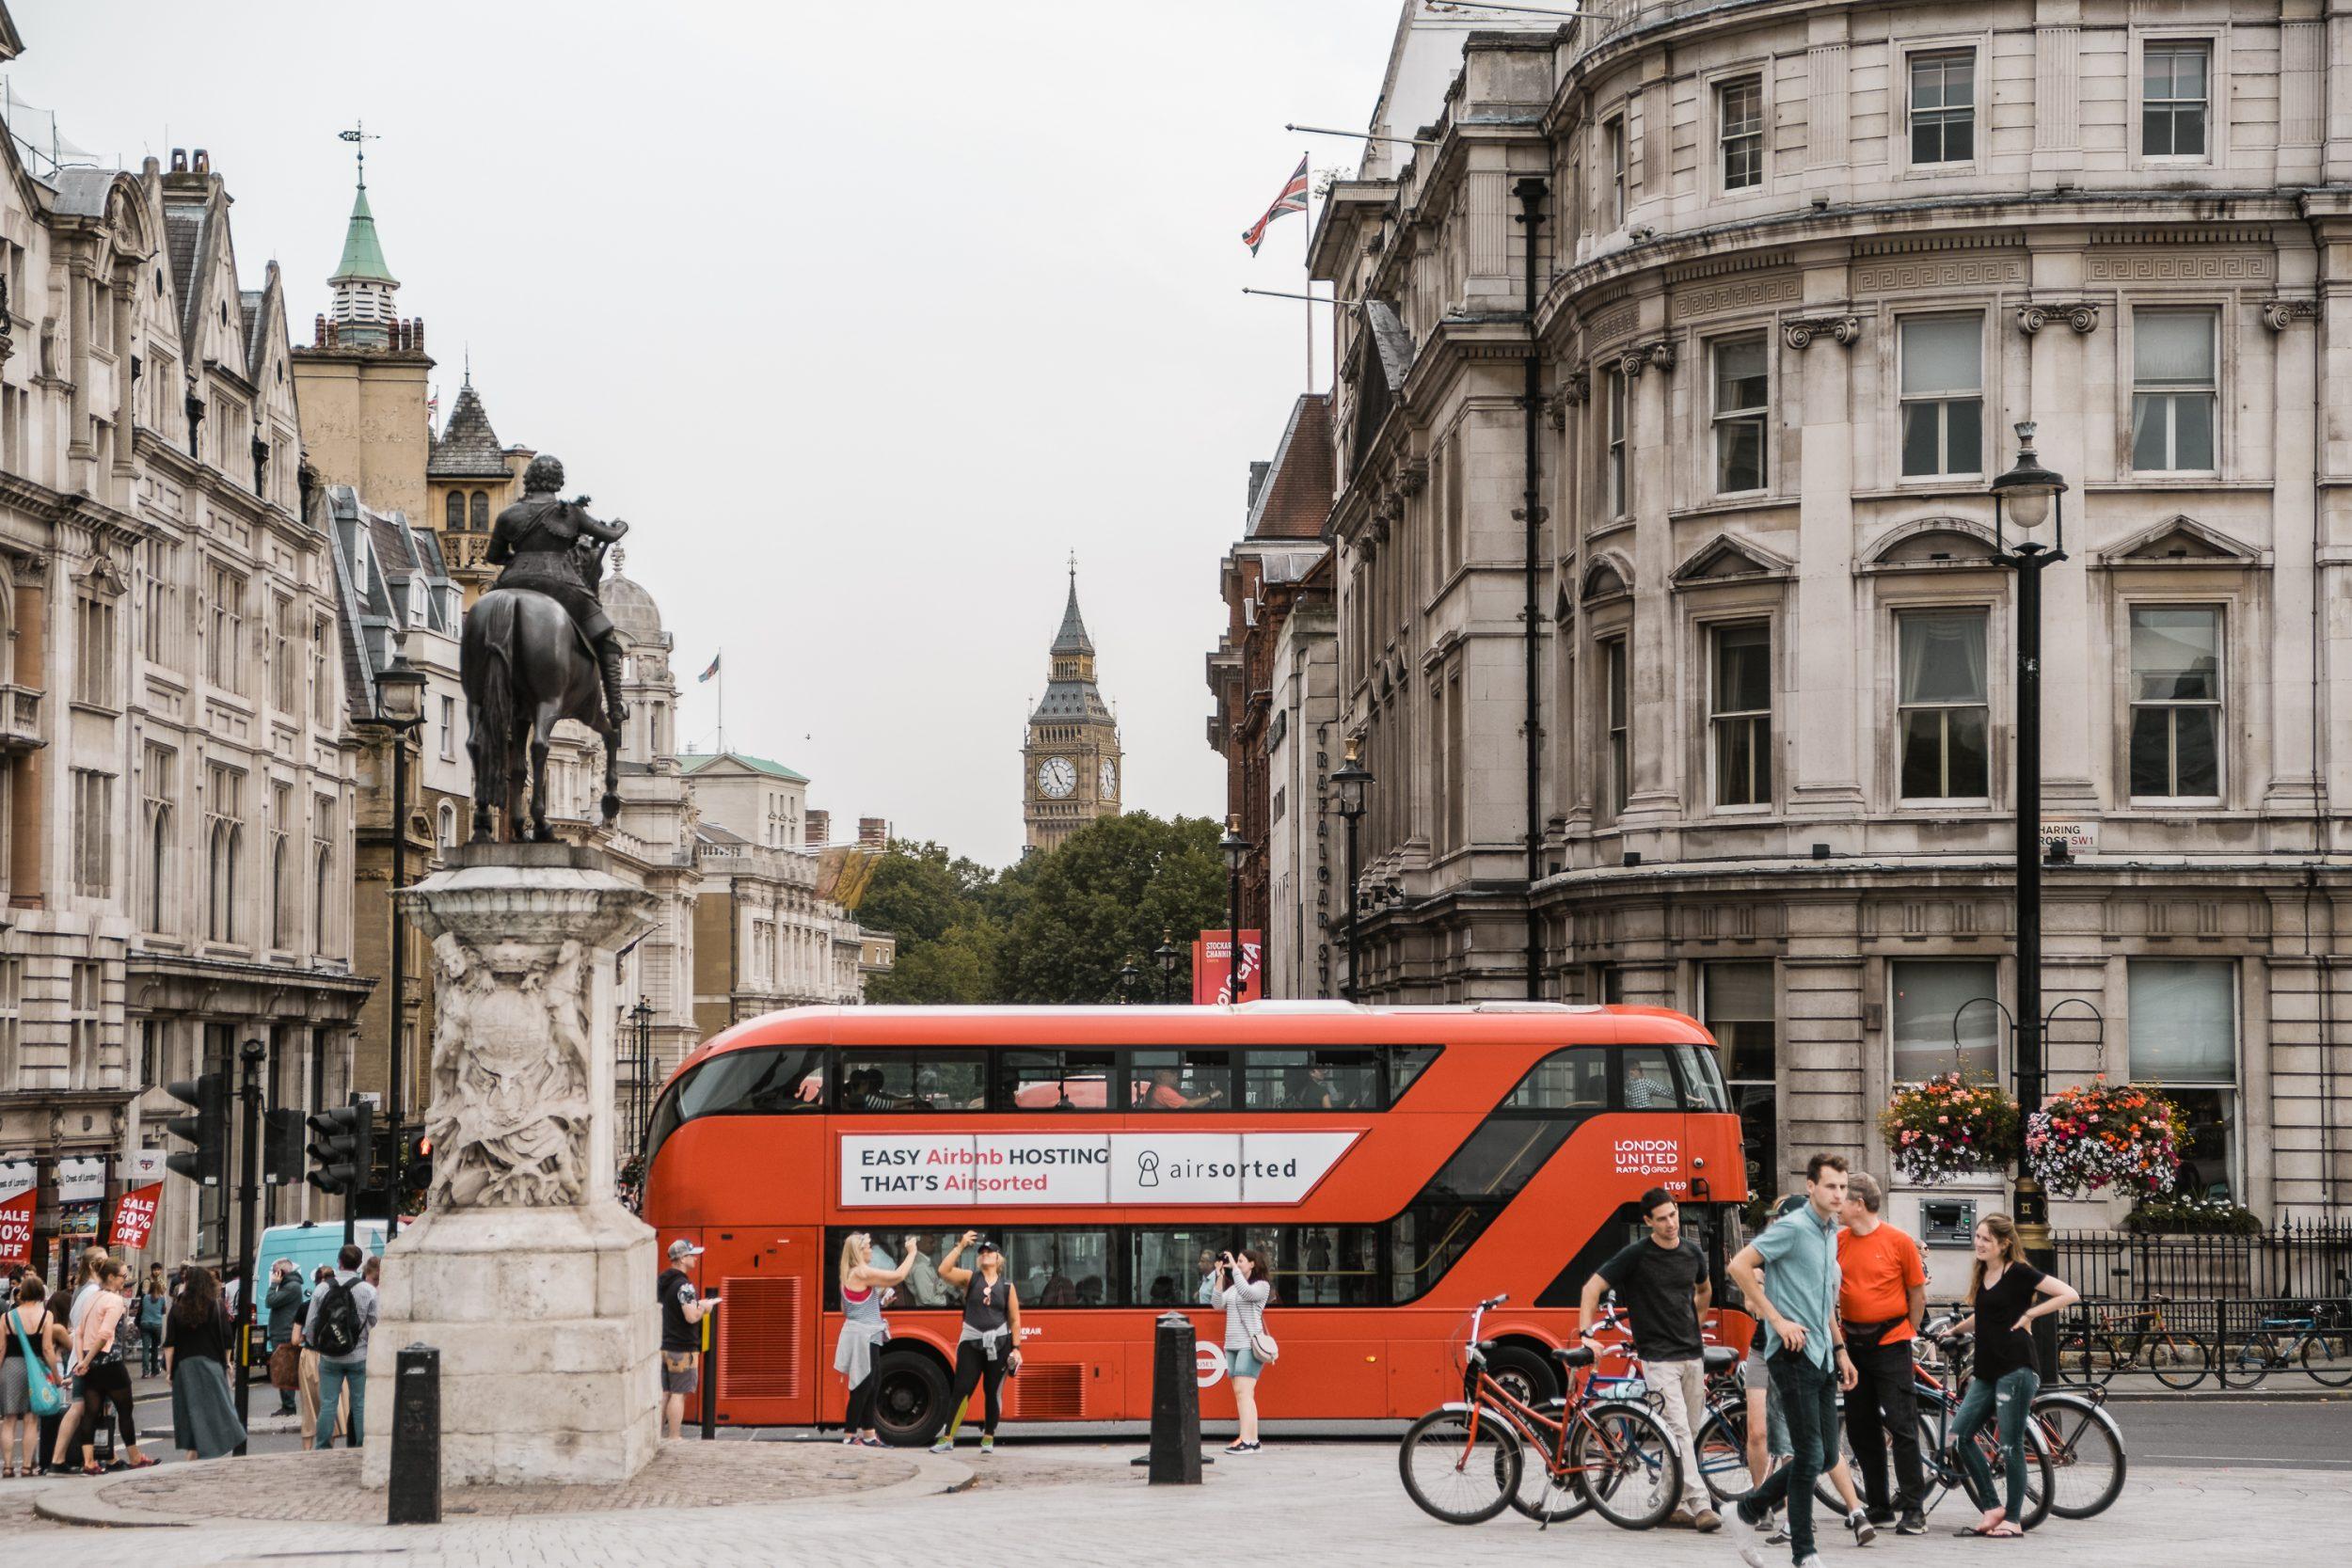 5-Day-London-Itinerary-1.jpg